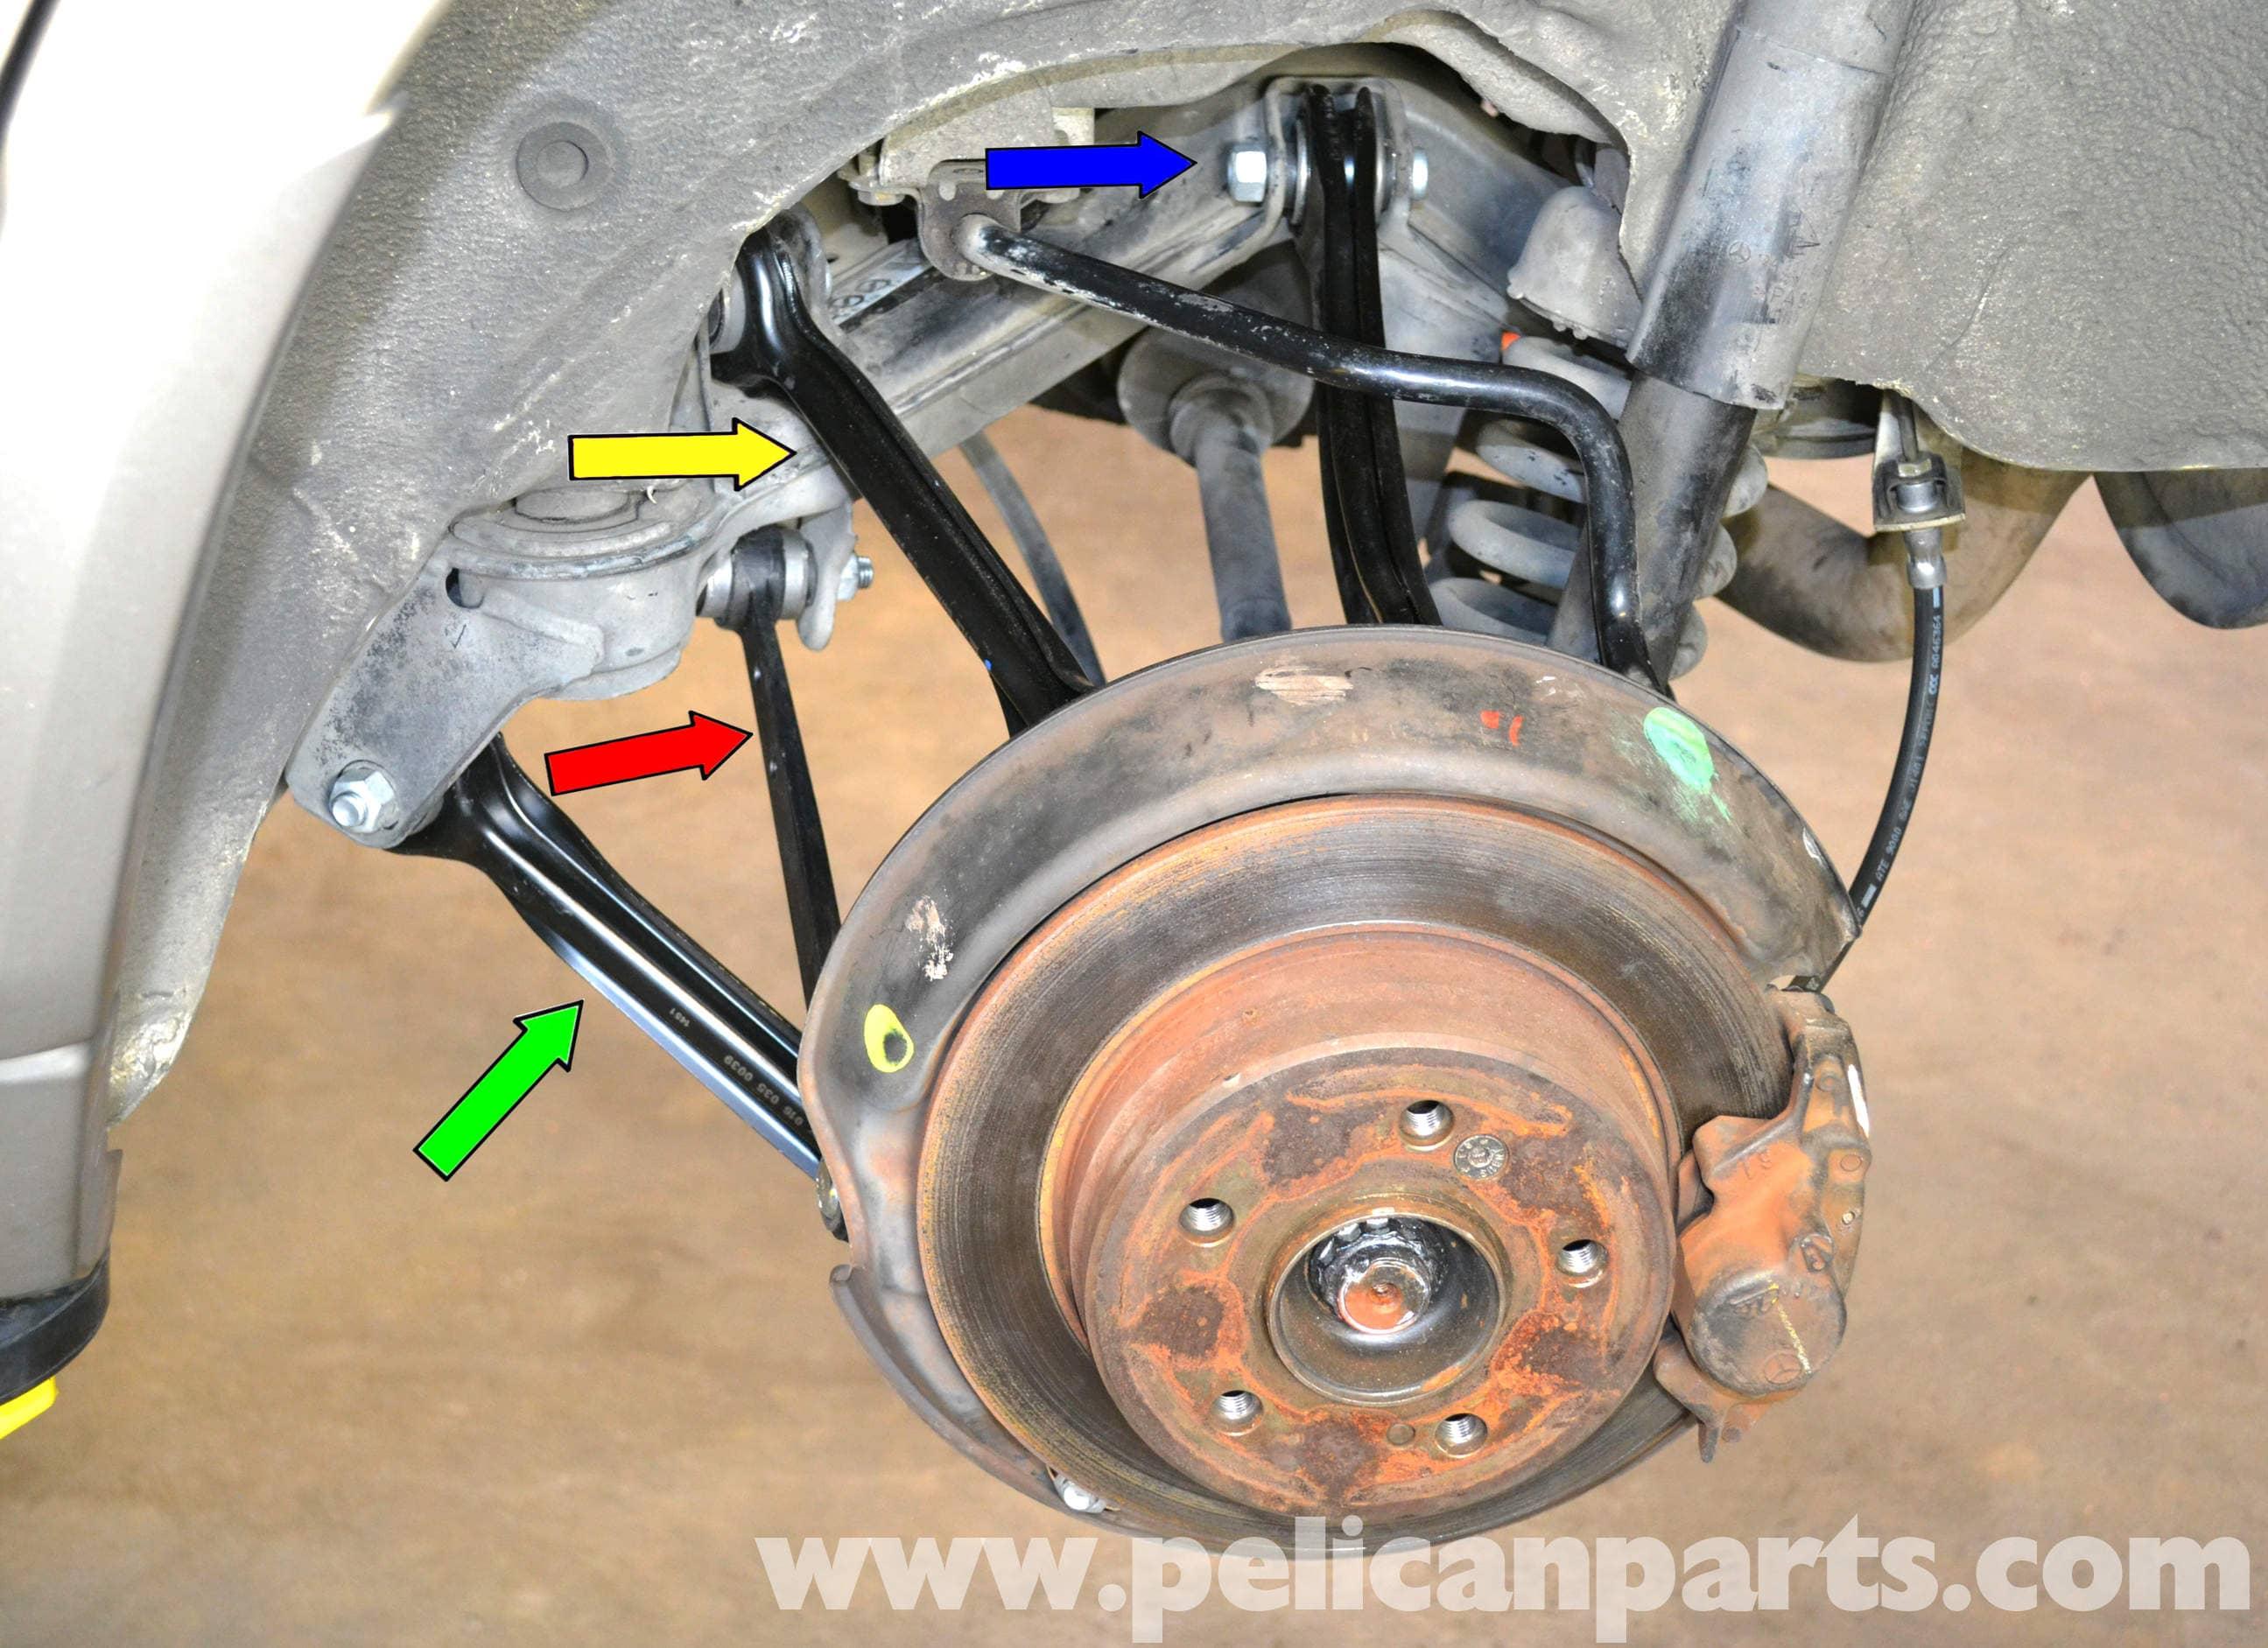 Mercedes benz 190e rear multi link suspension replacement for Replacement parts for mercedes benz